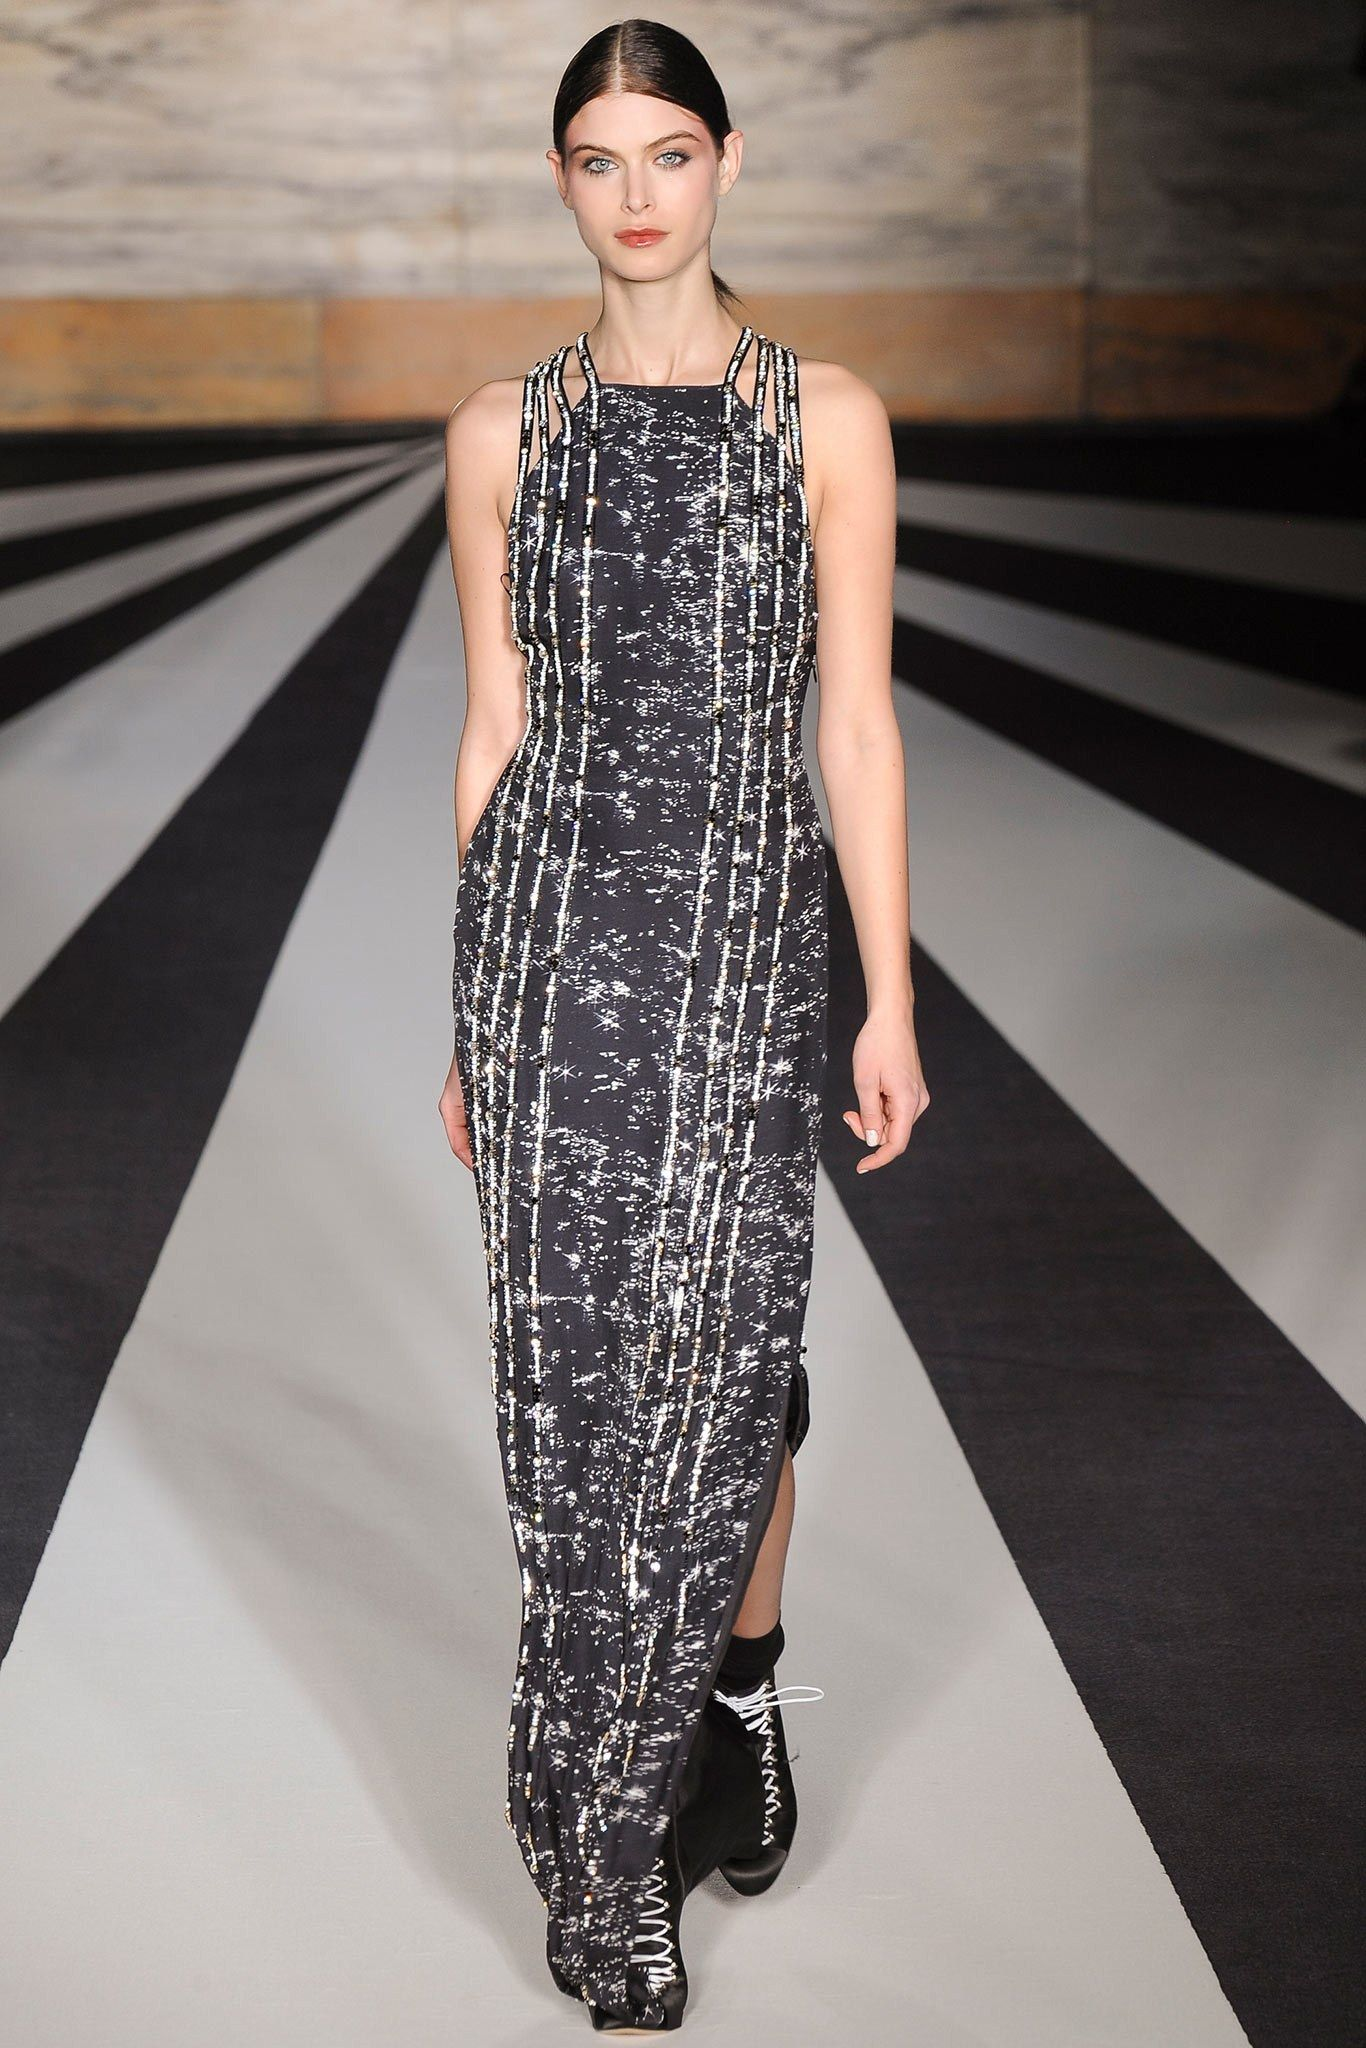 Matthew Williamson FallWinter 2014-2015 Collection – London Fashion Week